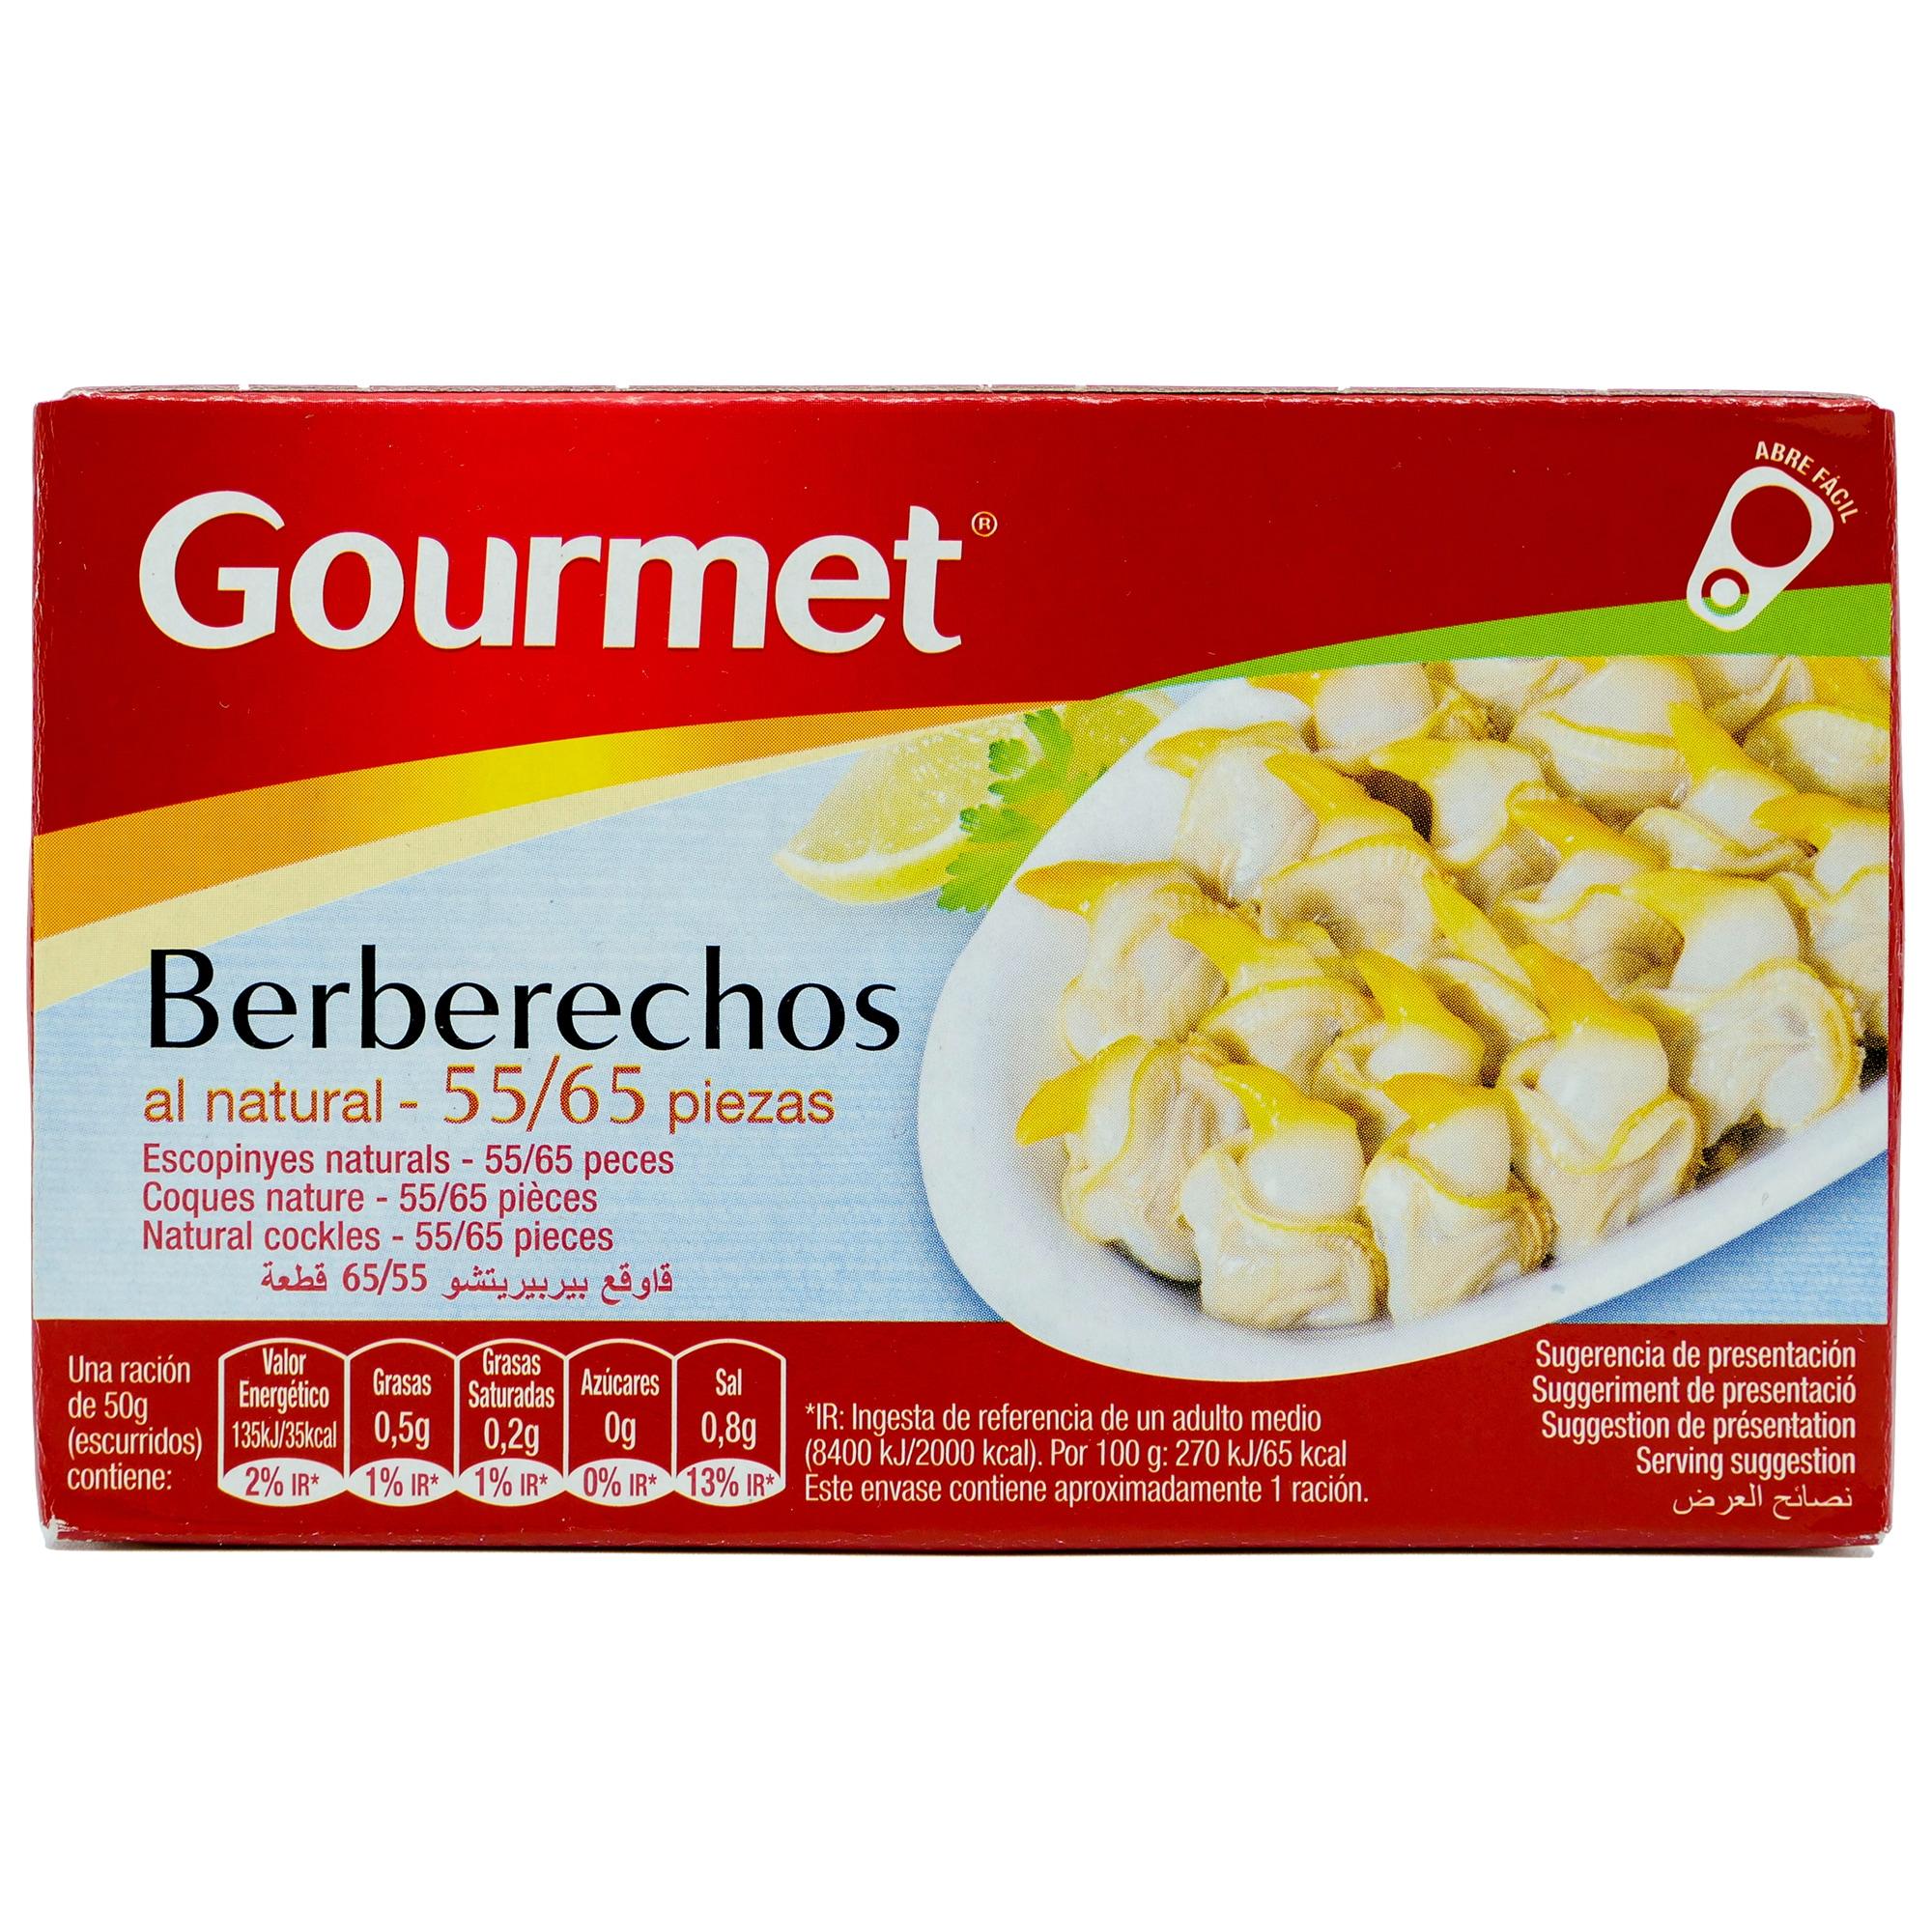 Gourmet Berberechos al natural Herzmuscheln in eigenem Saft 58g